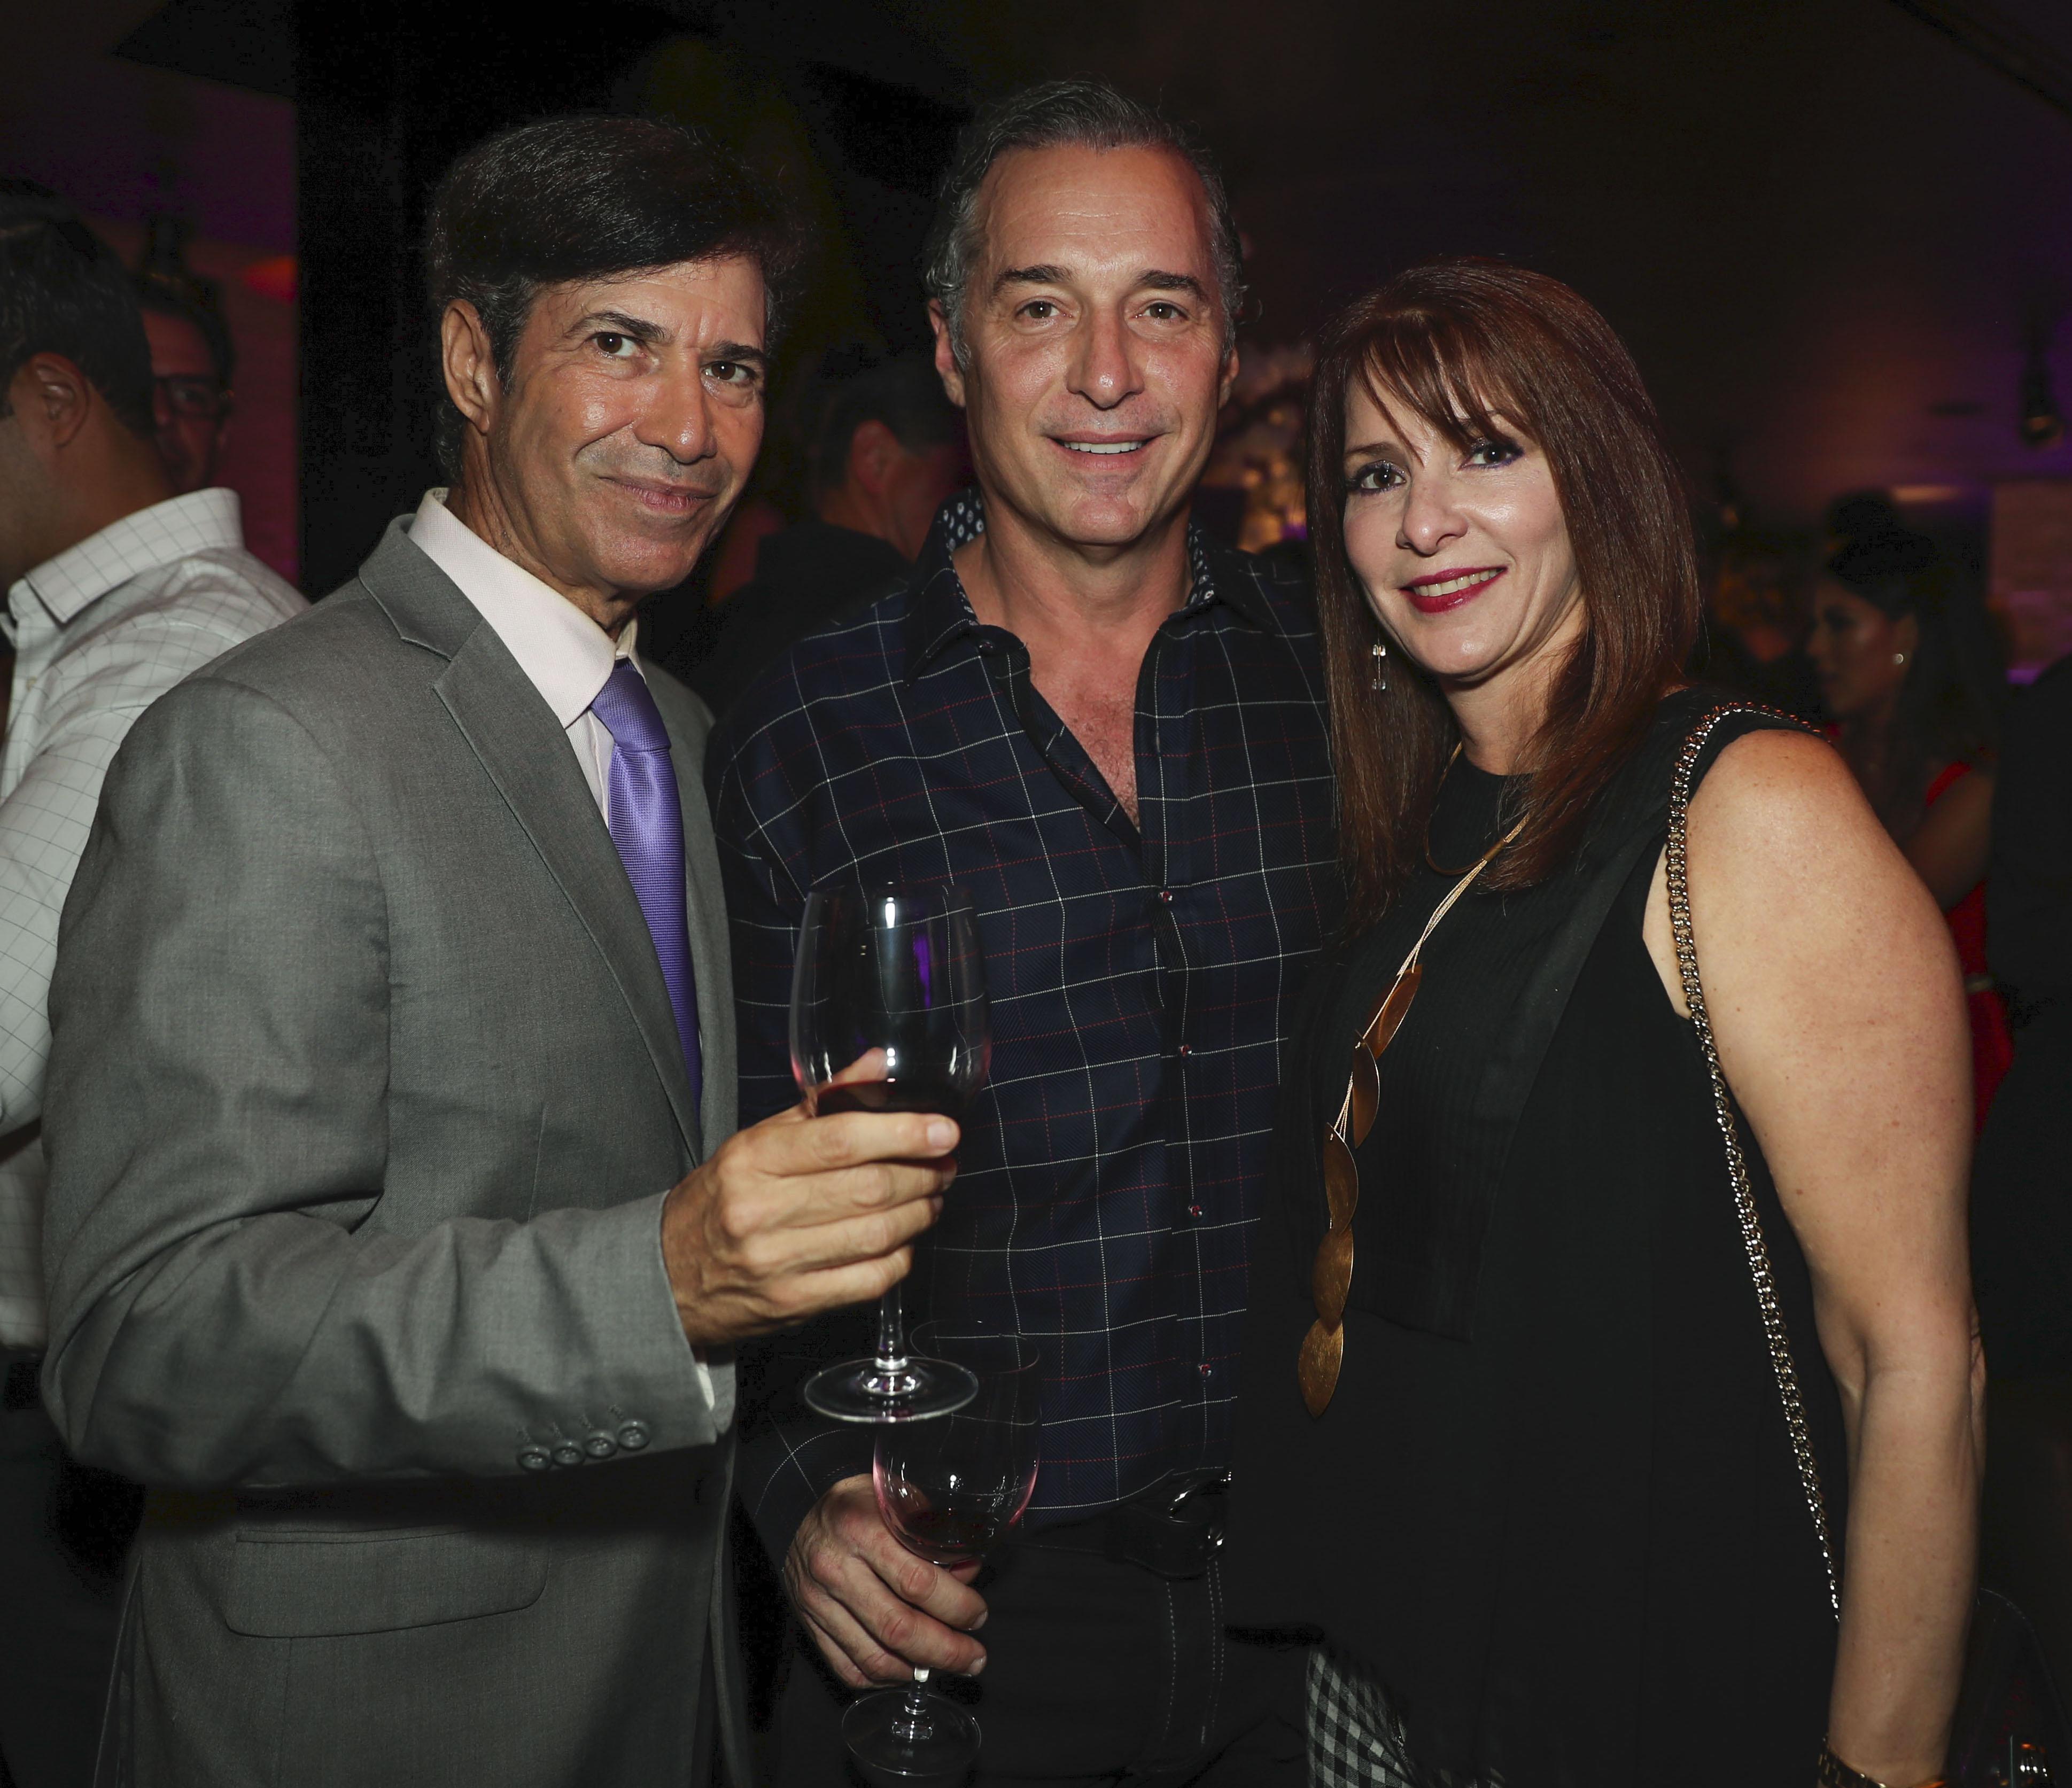 Jose L de Castilla, Eric y Tere Adler. (Suministrada)